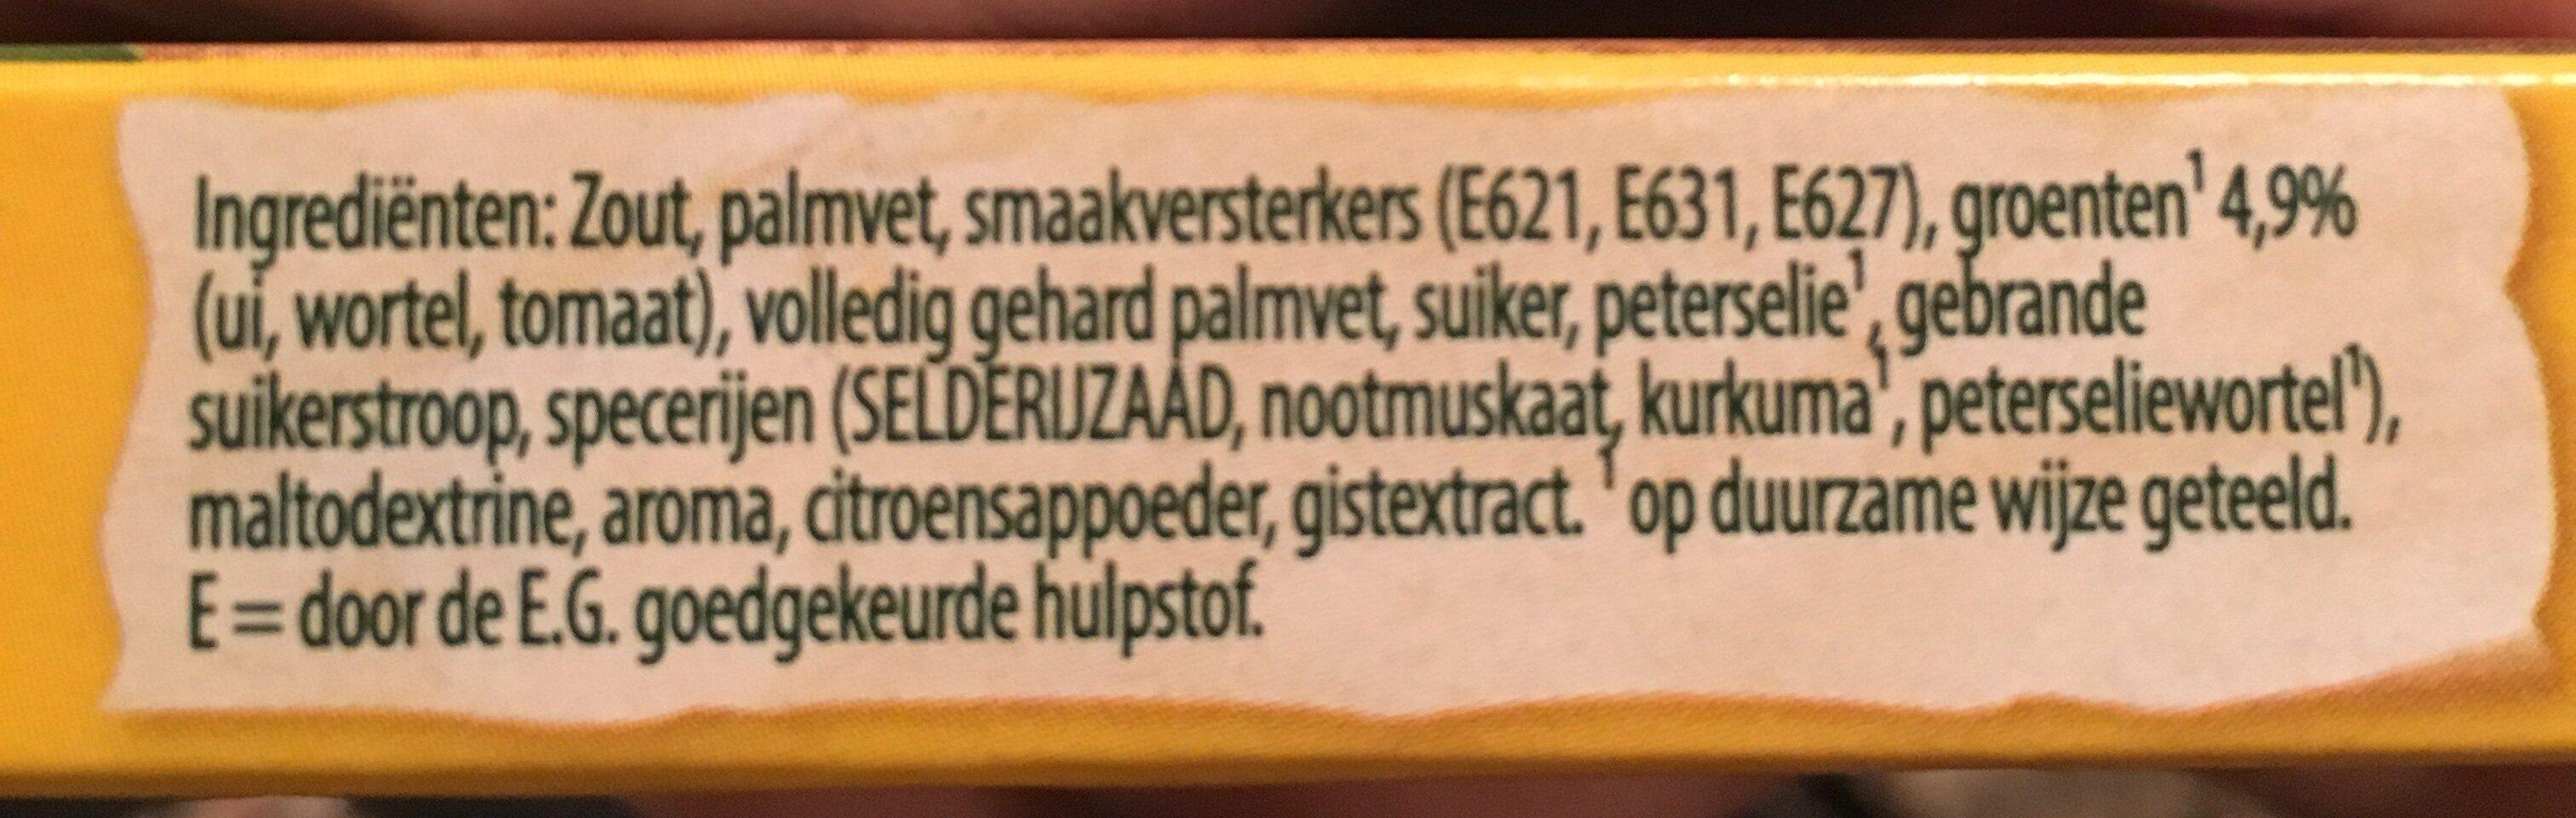 Groente bouillon - Ingrediënten - nl